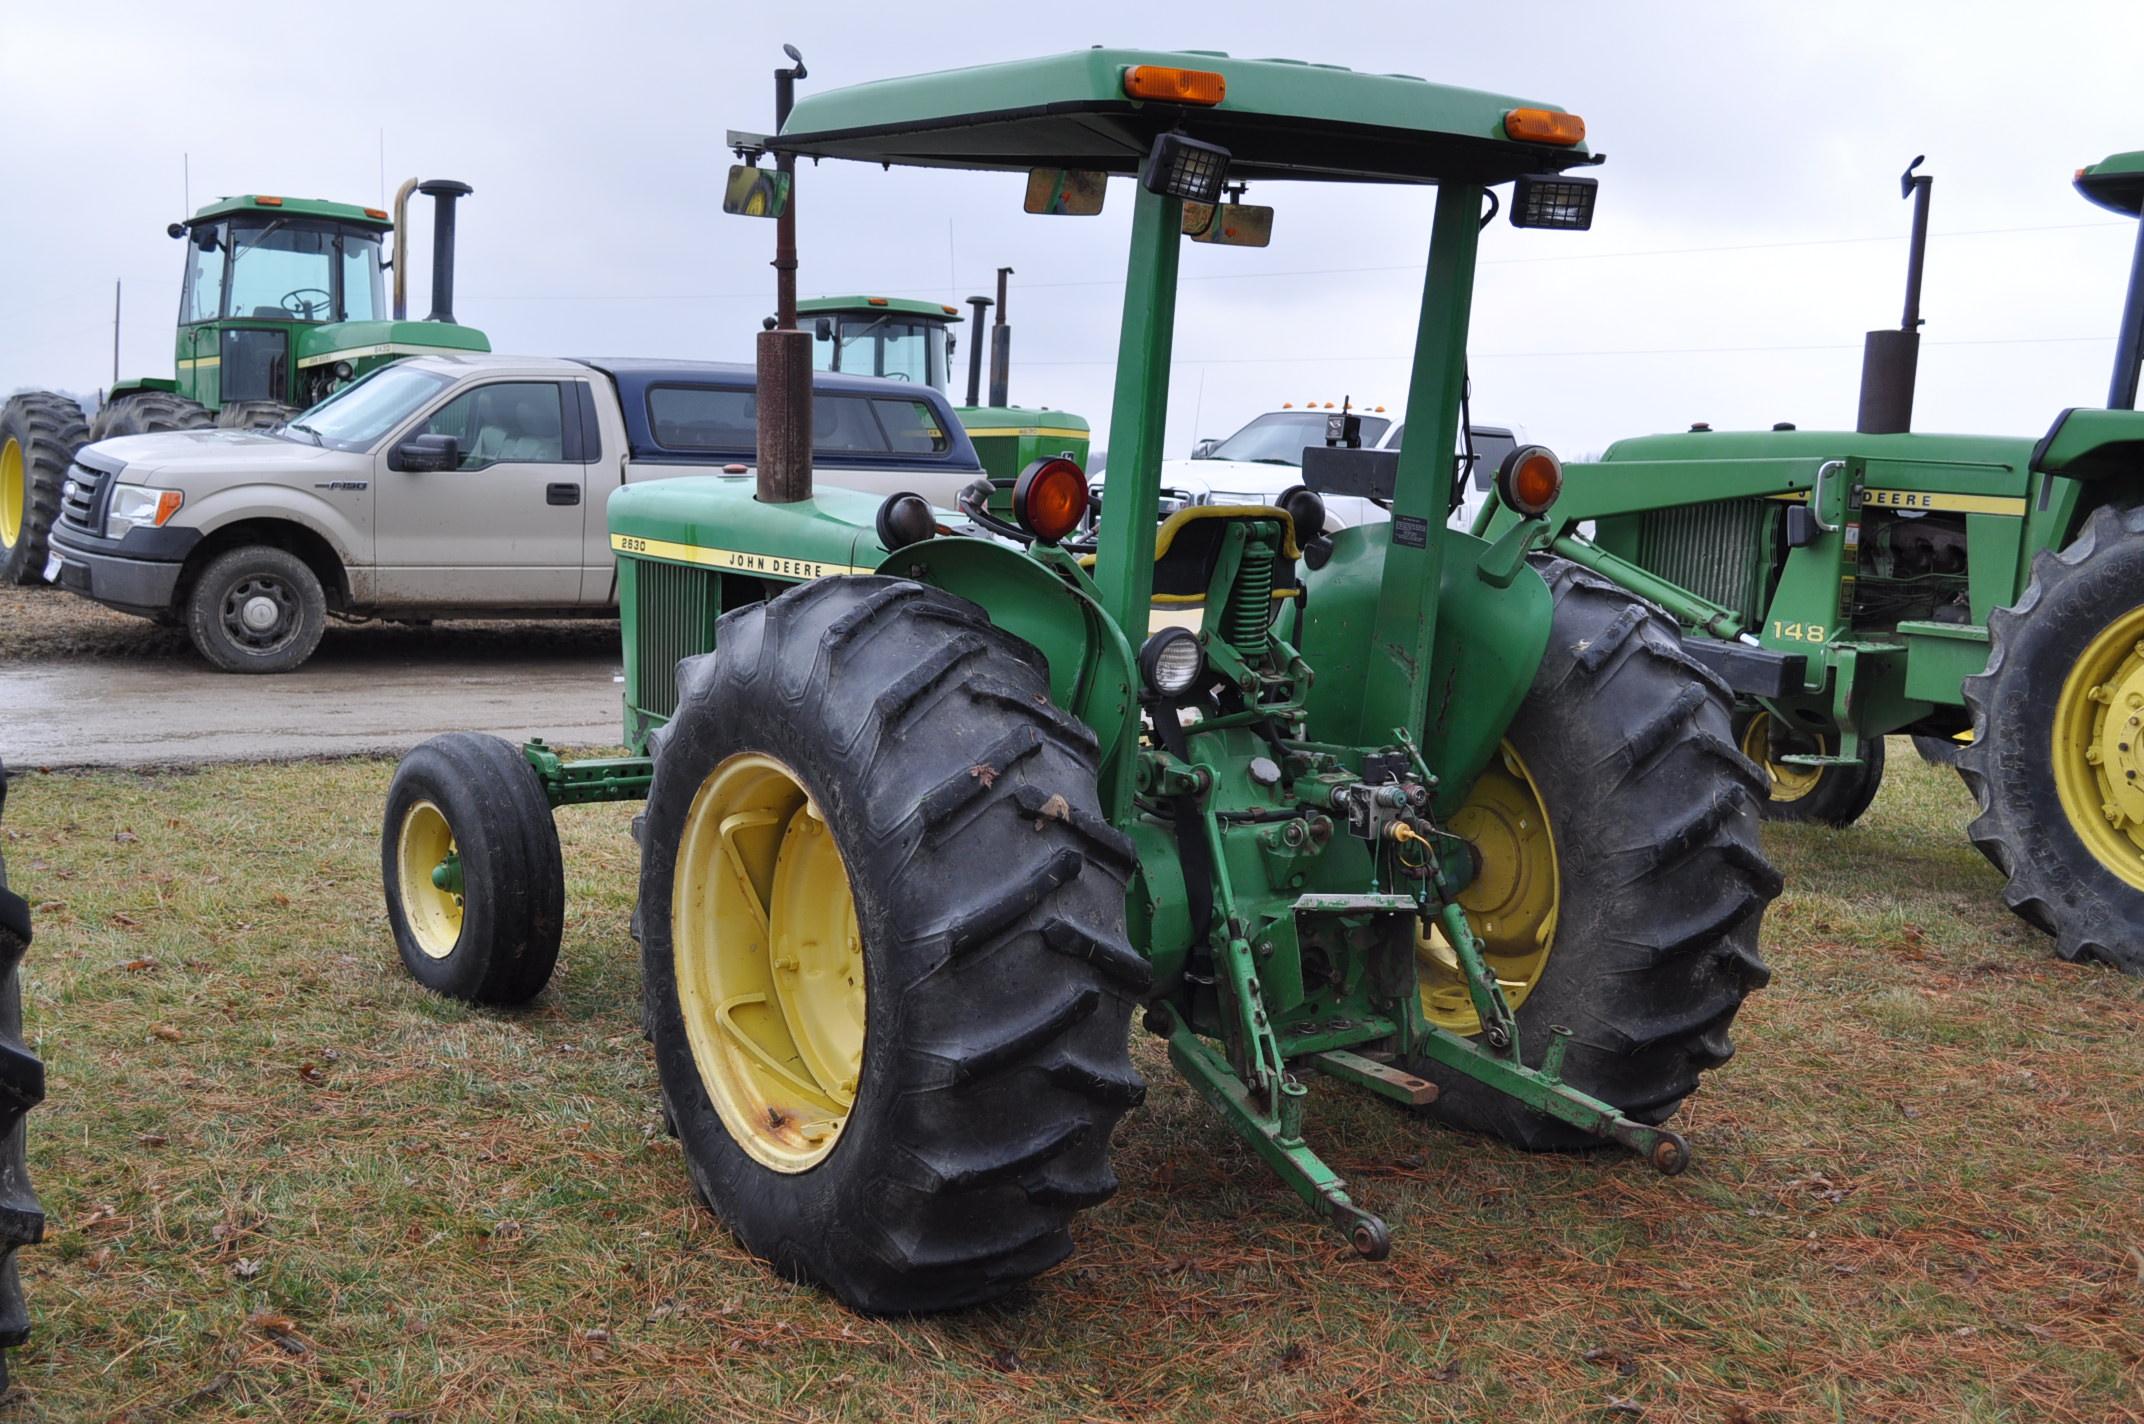 John Deere 2630 tractor, diesel, 16.9-28 rear, 9.5-15 front, 1 hyd remote, 540 pto, 3 pt, 4260 - Image 2 of 18